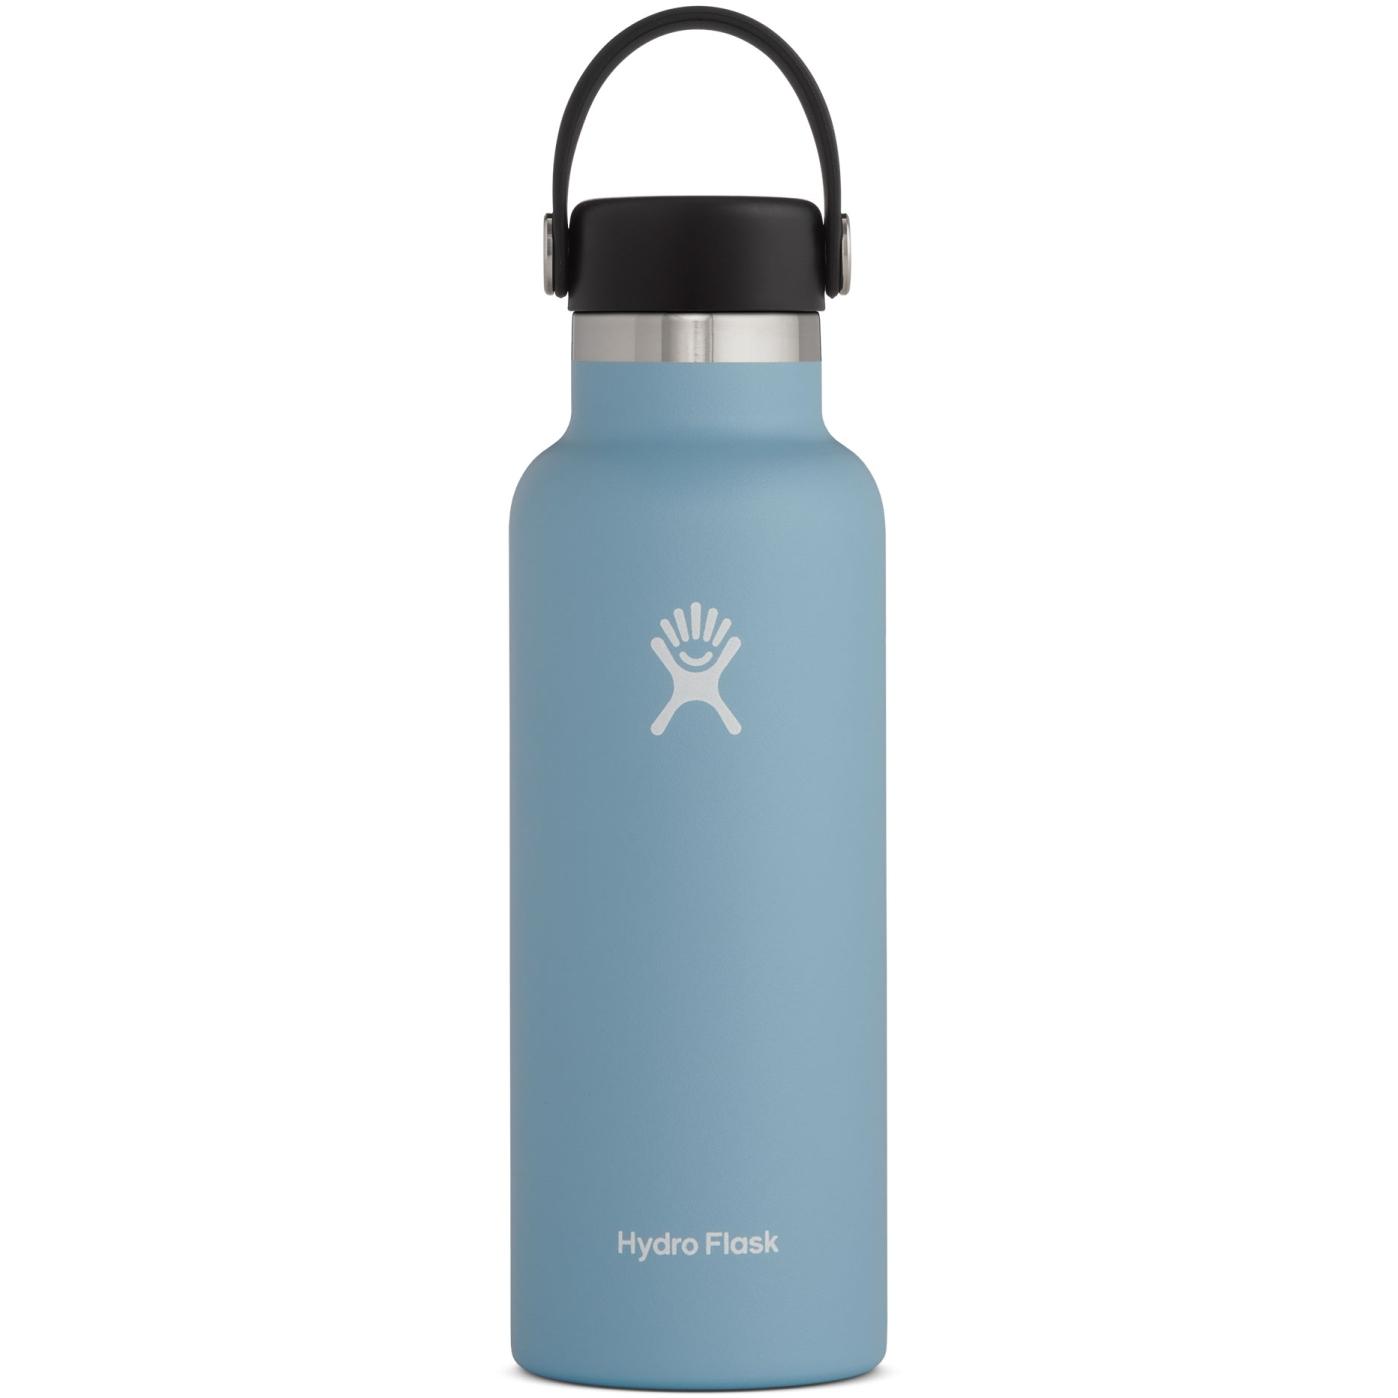 Hydro Flask 18oz Standard Mouth Flex Cap Thermoflasche - 532ml - Rain